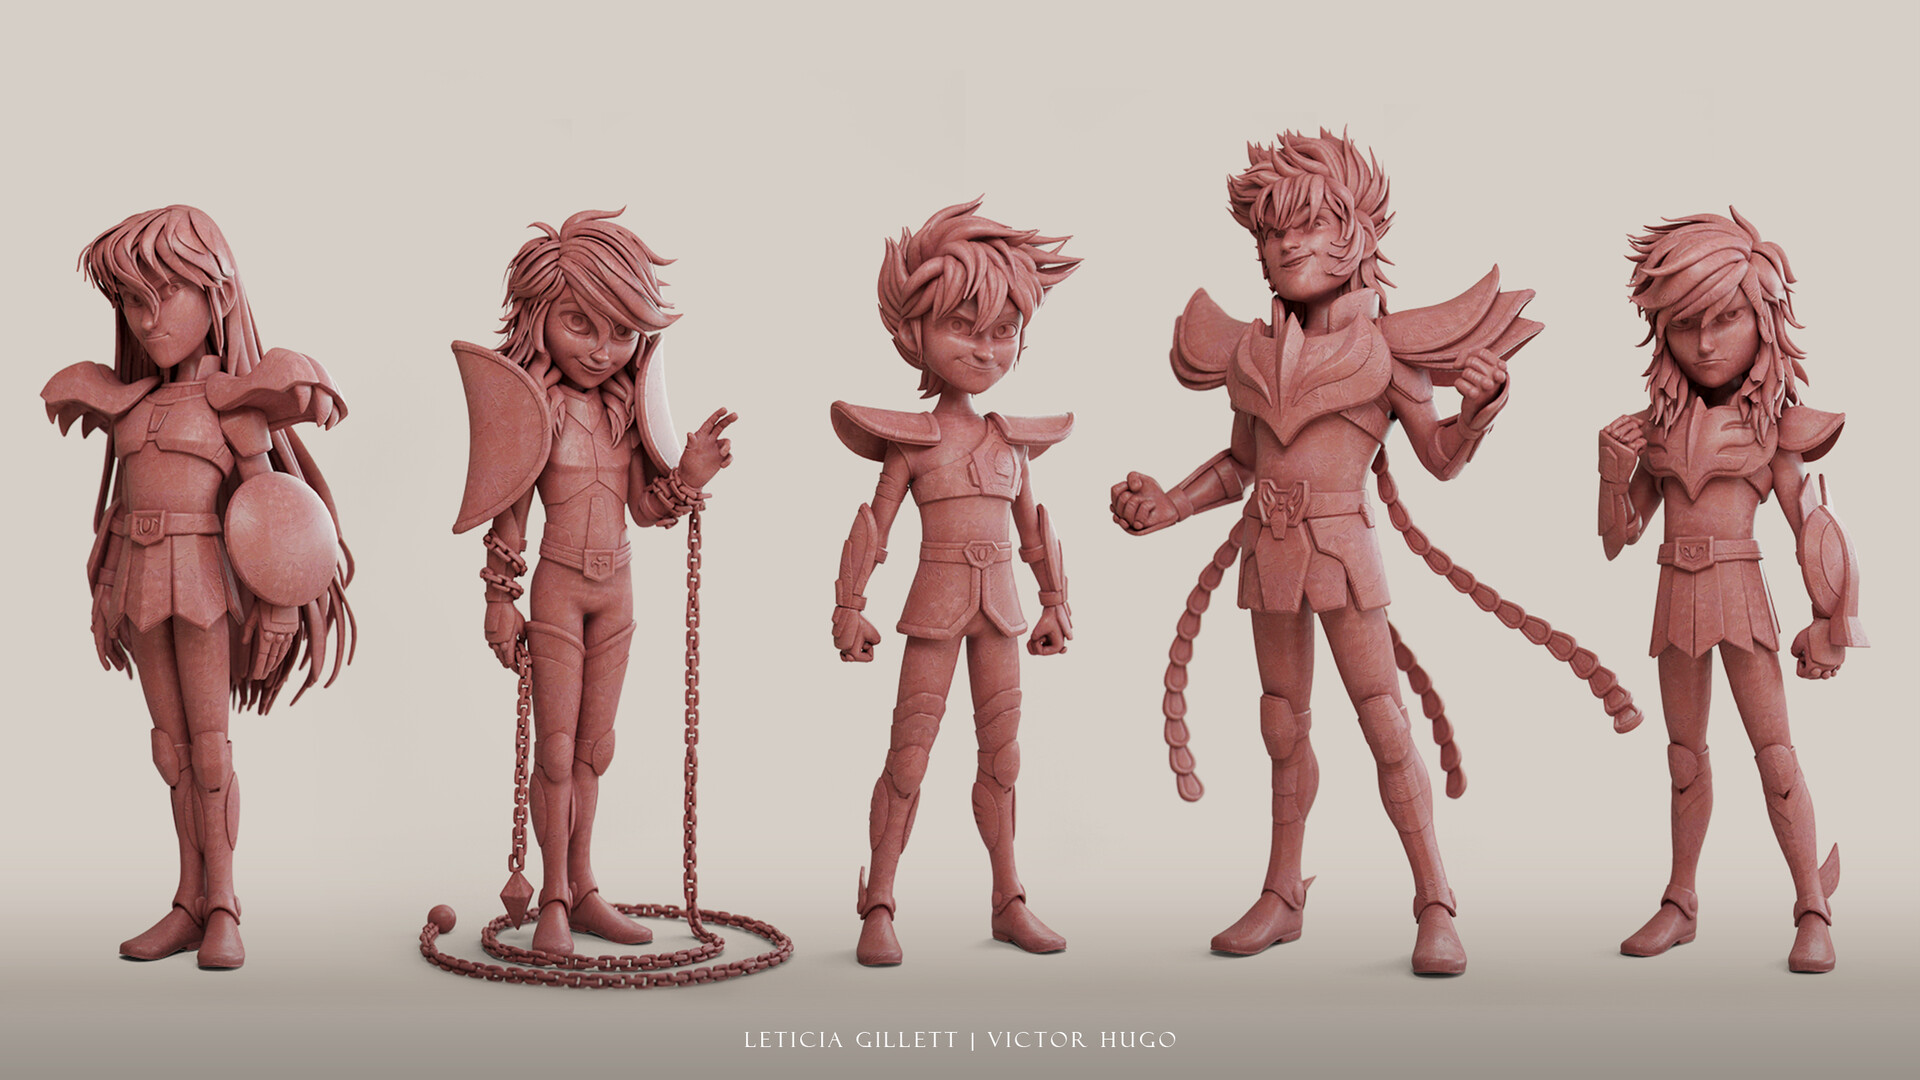 Lineup clay render